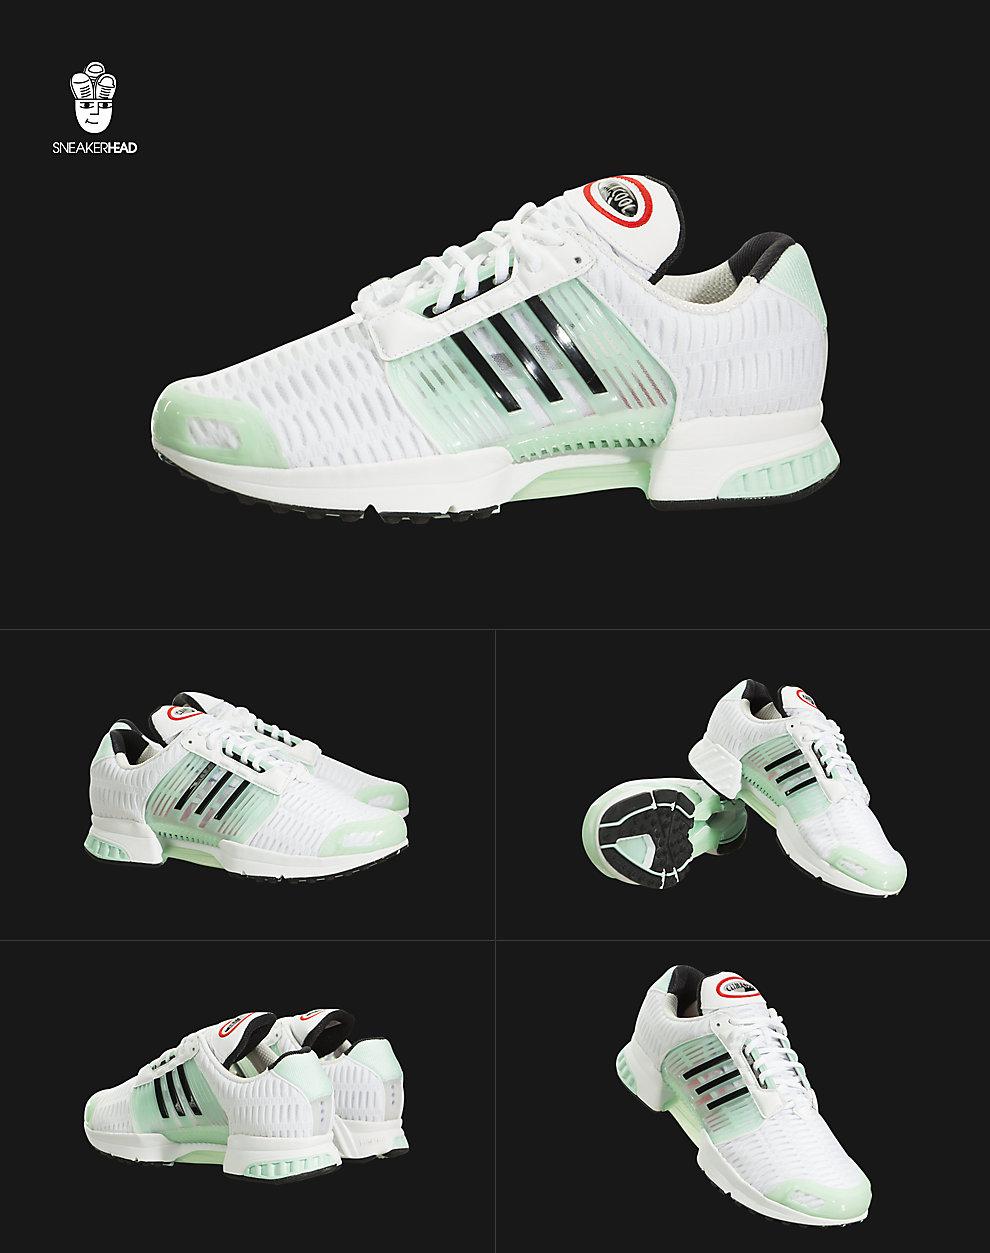 hot sale online 75b39 e160a ... ba8576 White  Ice Green-Black 白色